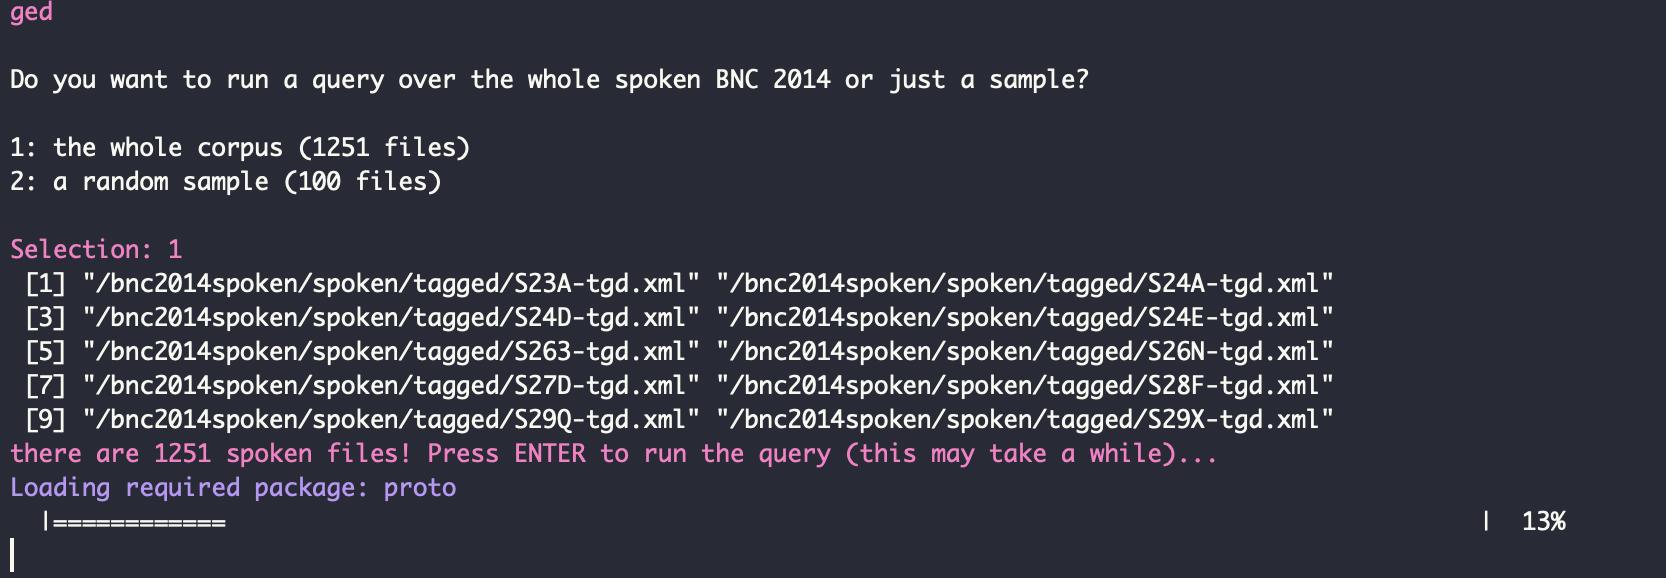 BNC 2014 query()  An interactive R script for a